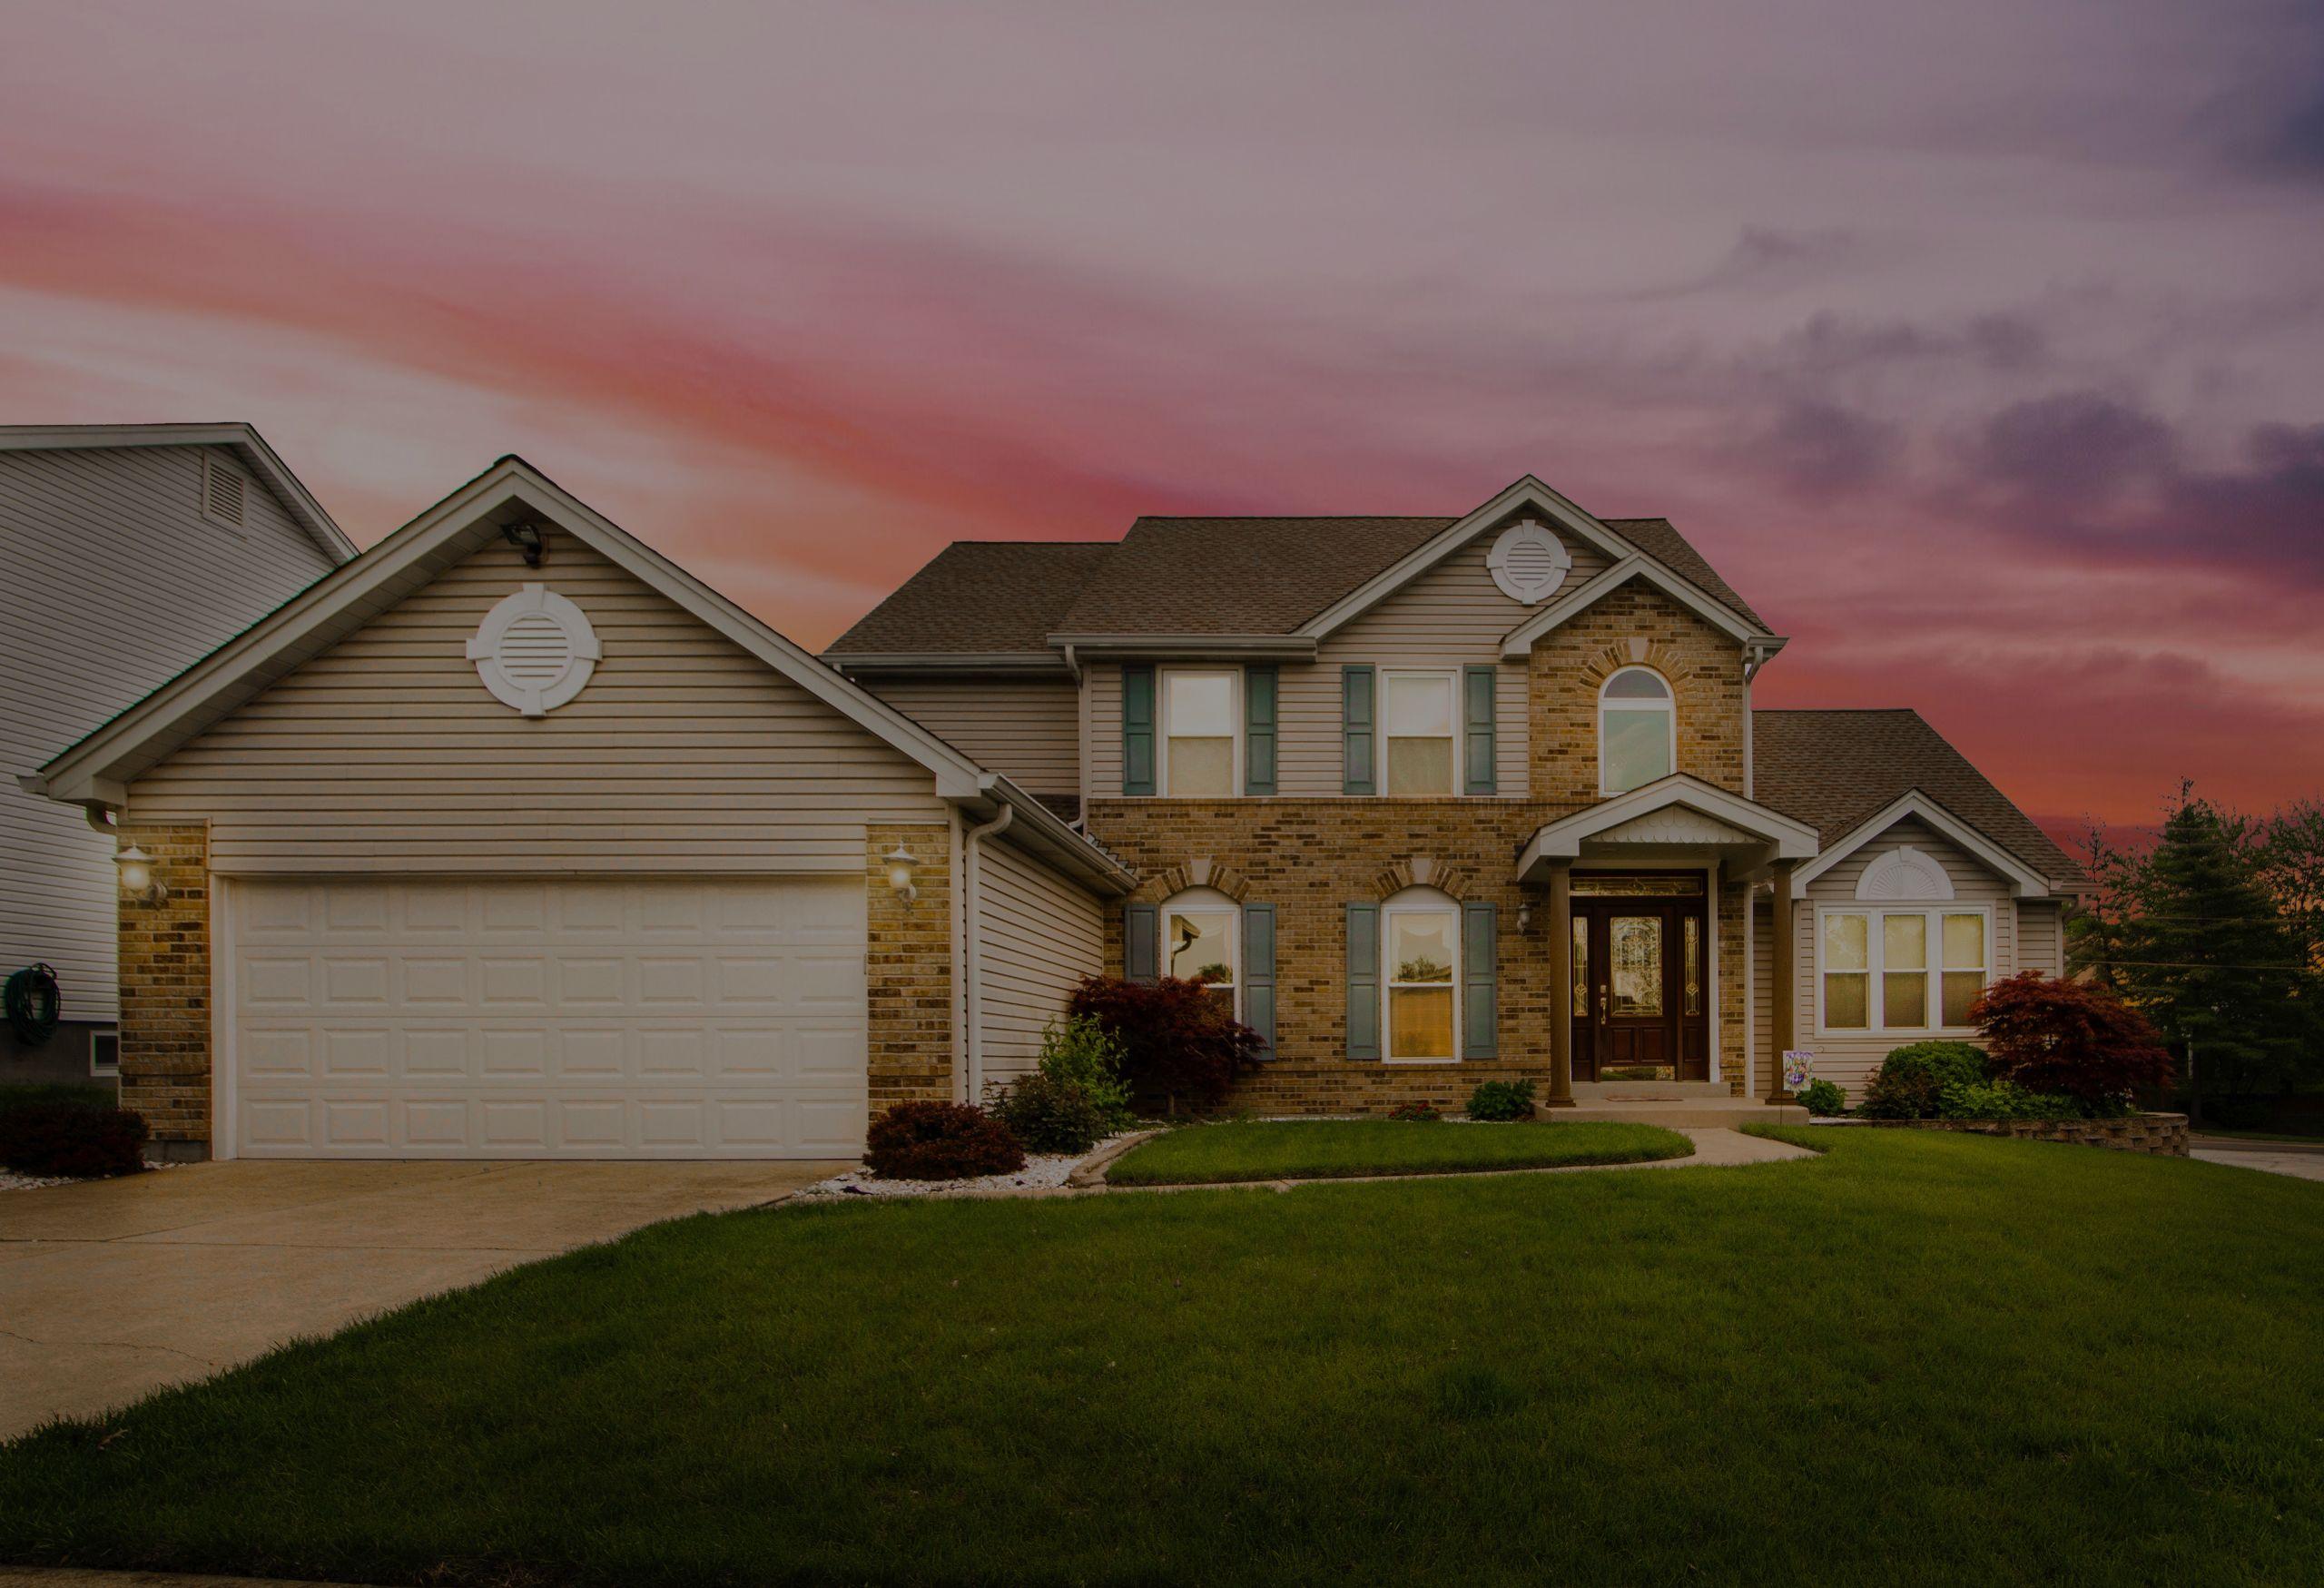 A Mortgage Update from Scott Layden